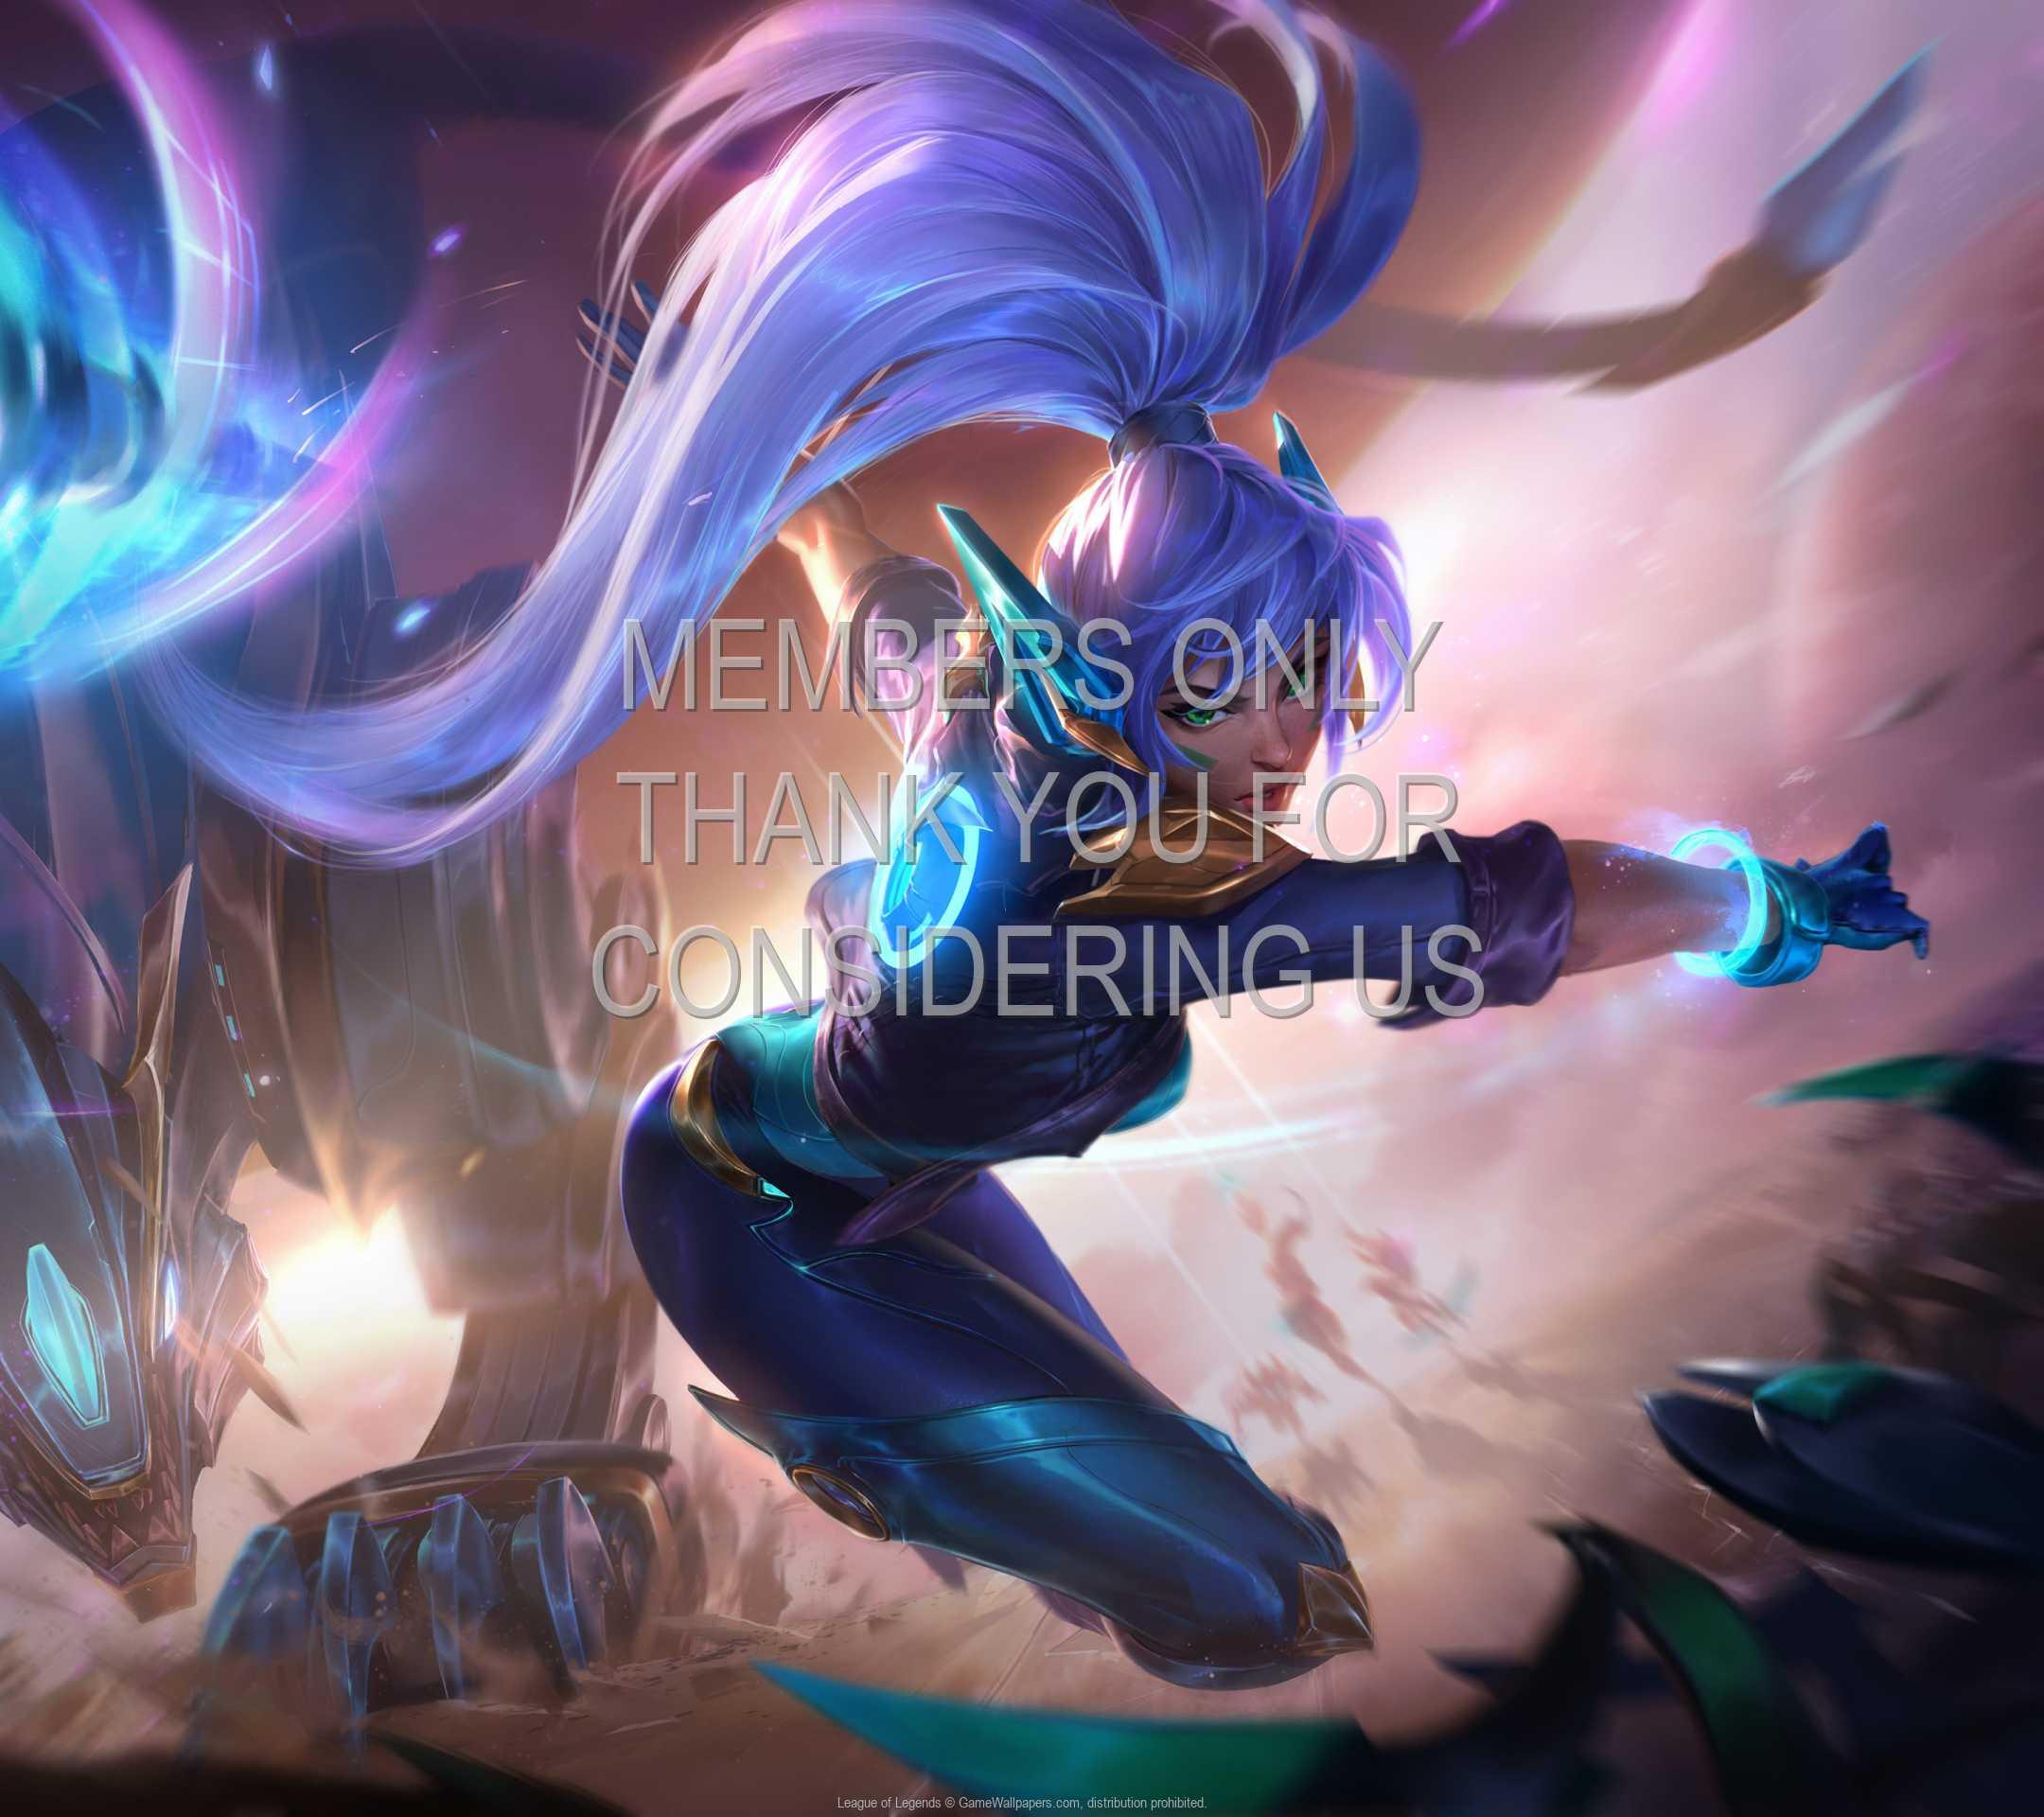 League of Legends 1080p Horizontal Handy Hintergrundbild 95